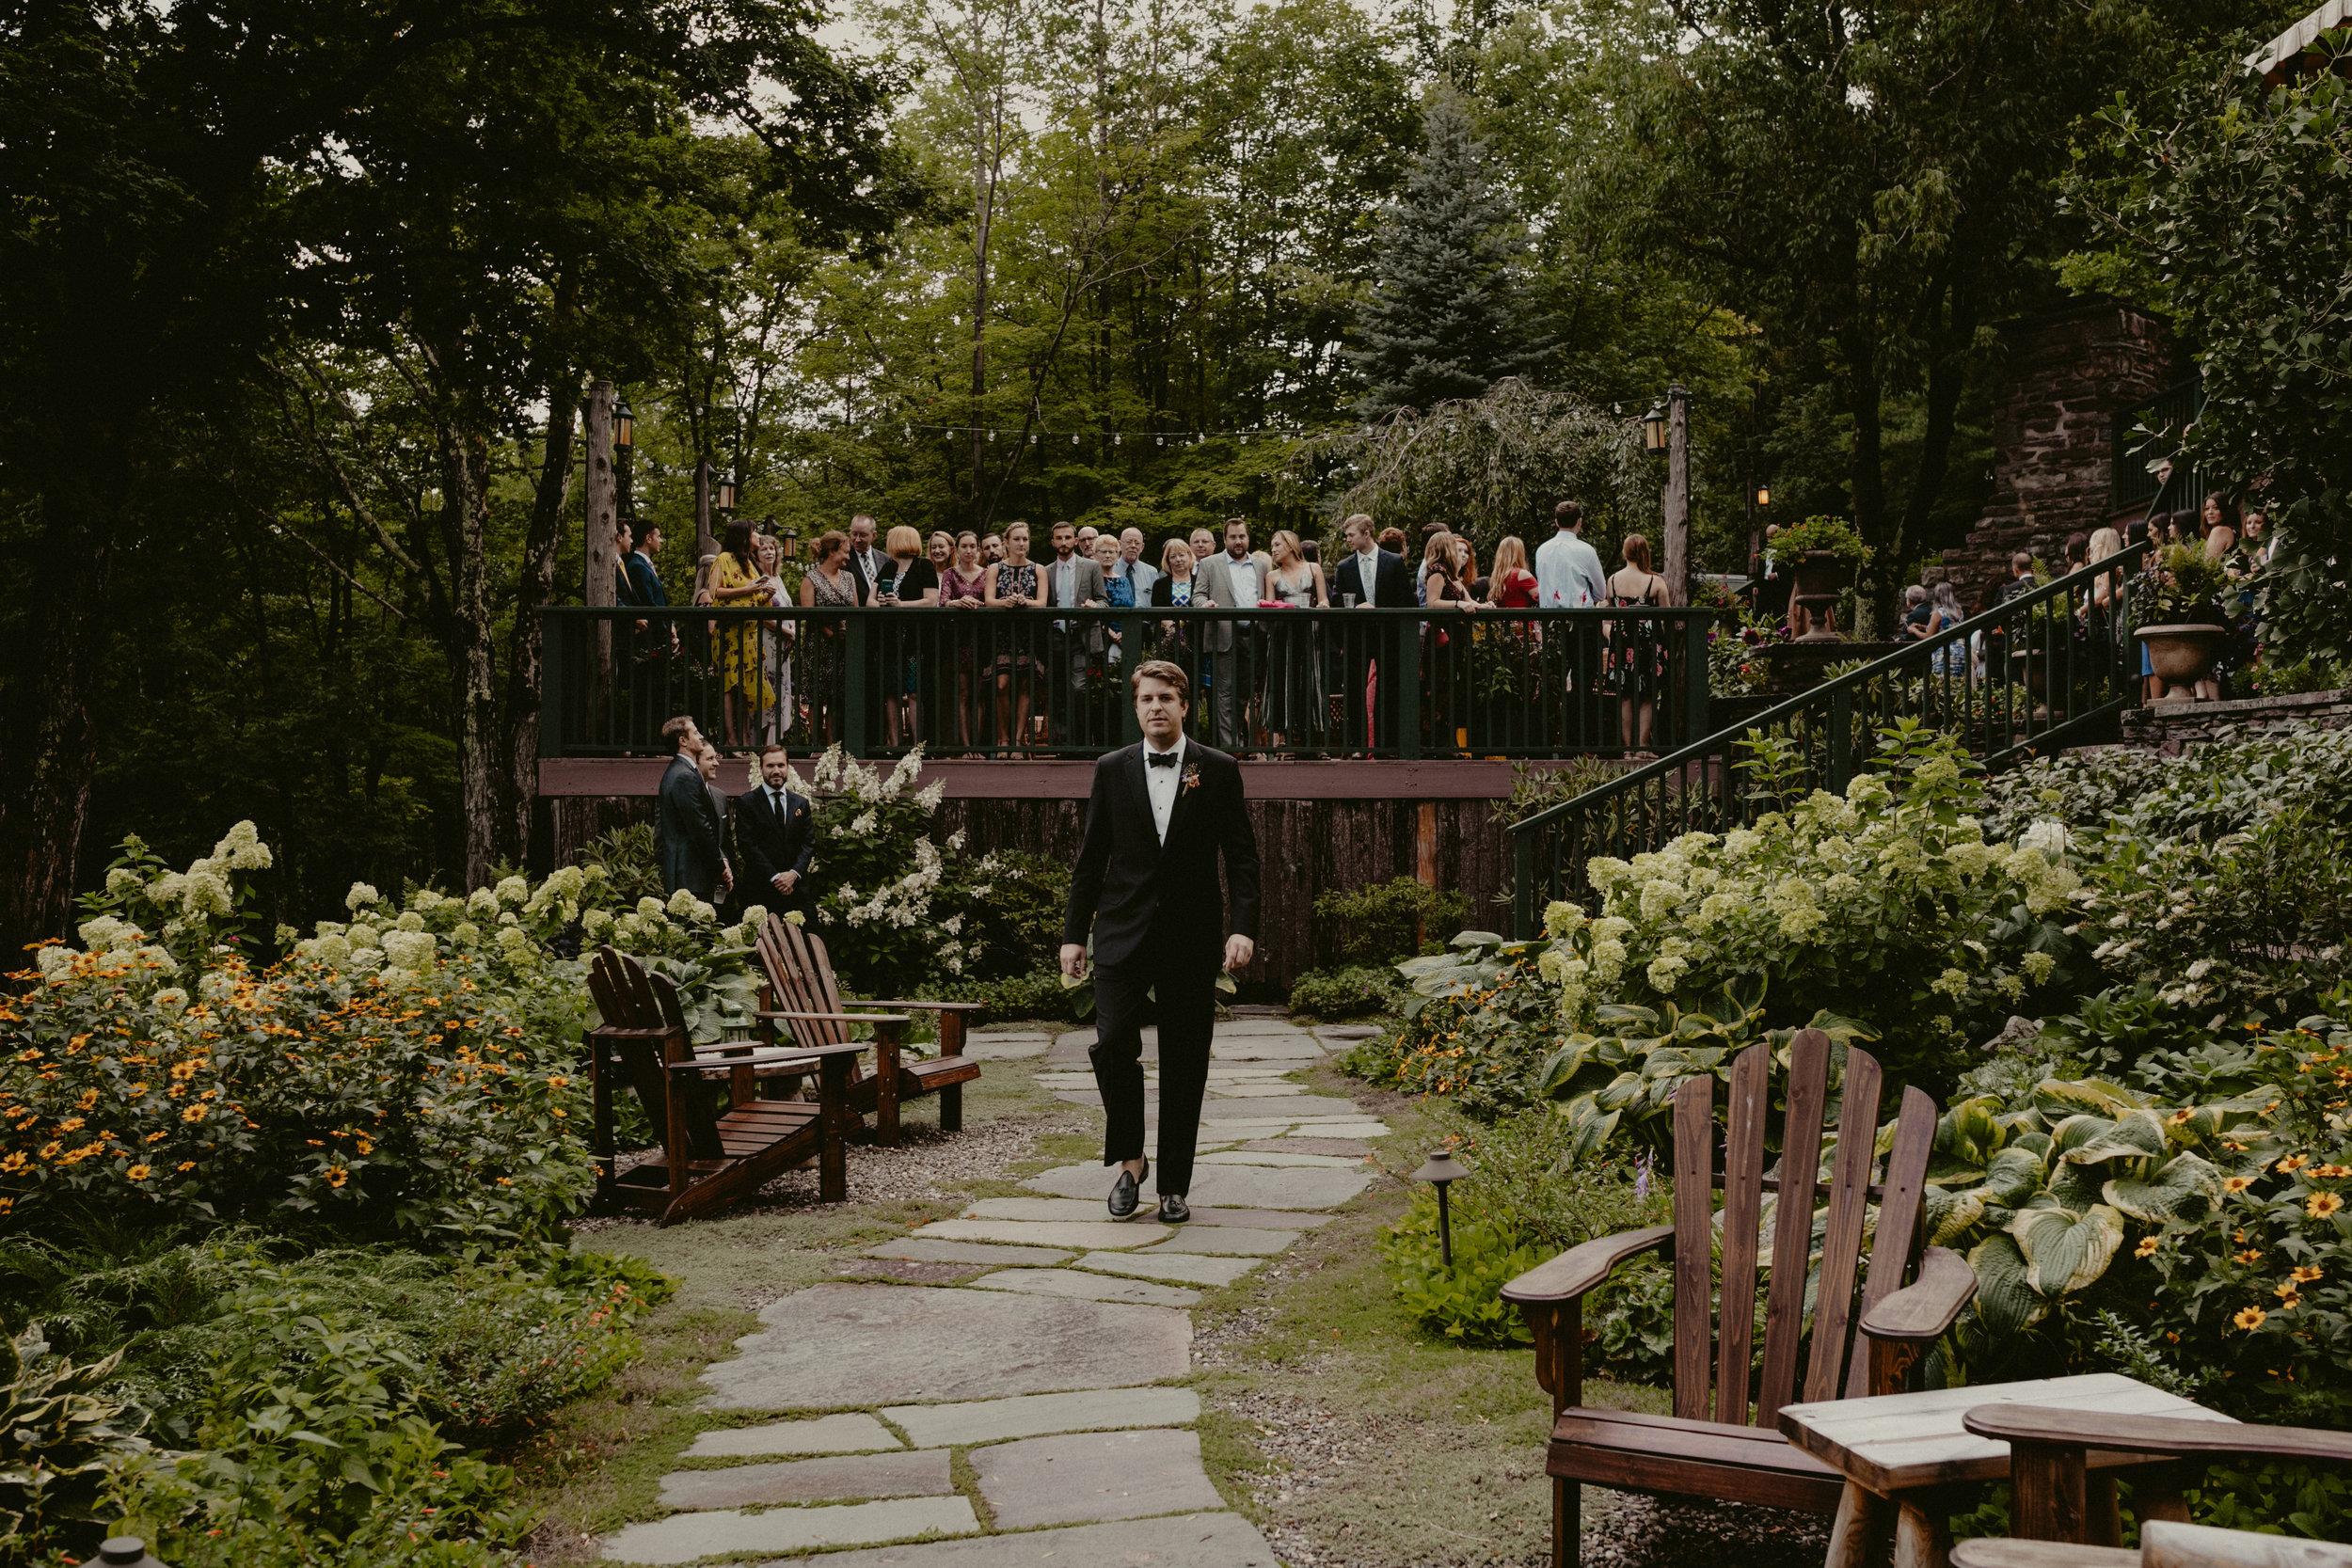 DEER_MOUNTAIN_INN_WEDDING_CHELLISE_MICHAEL_PHOTOGRAPHY-1322.jpg